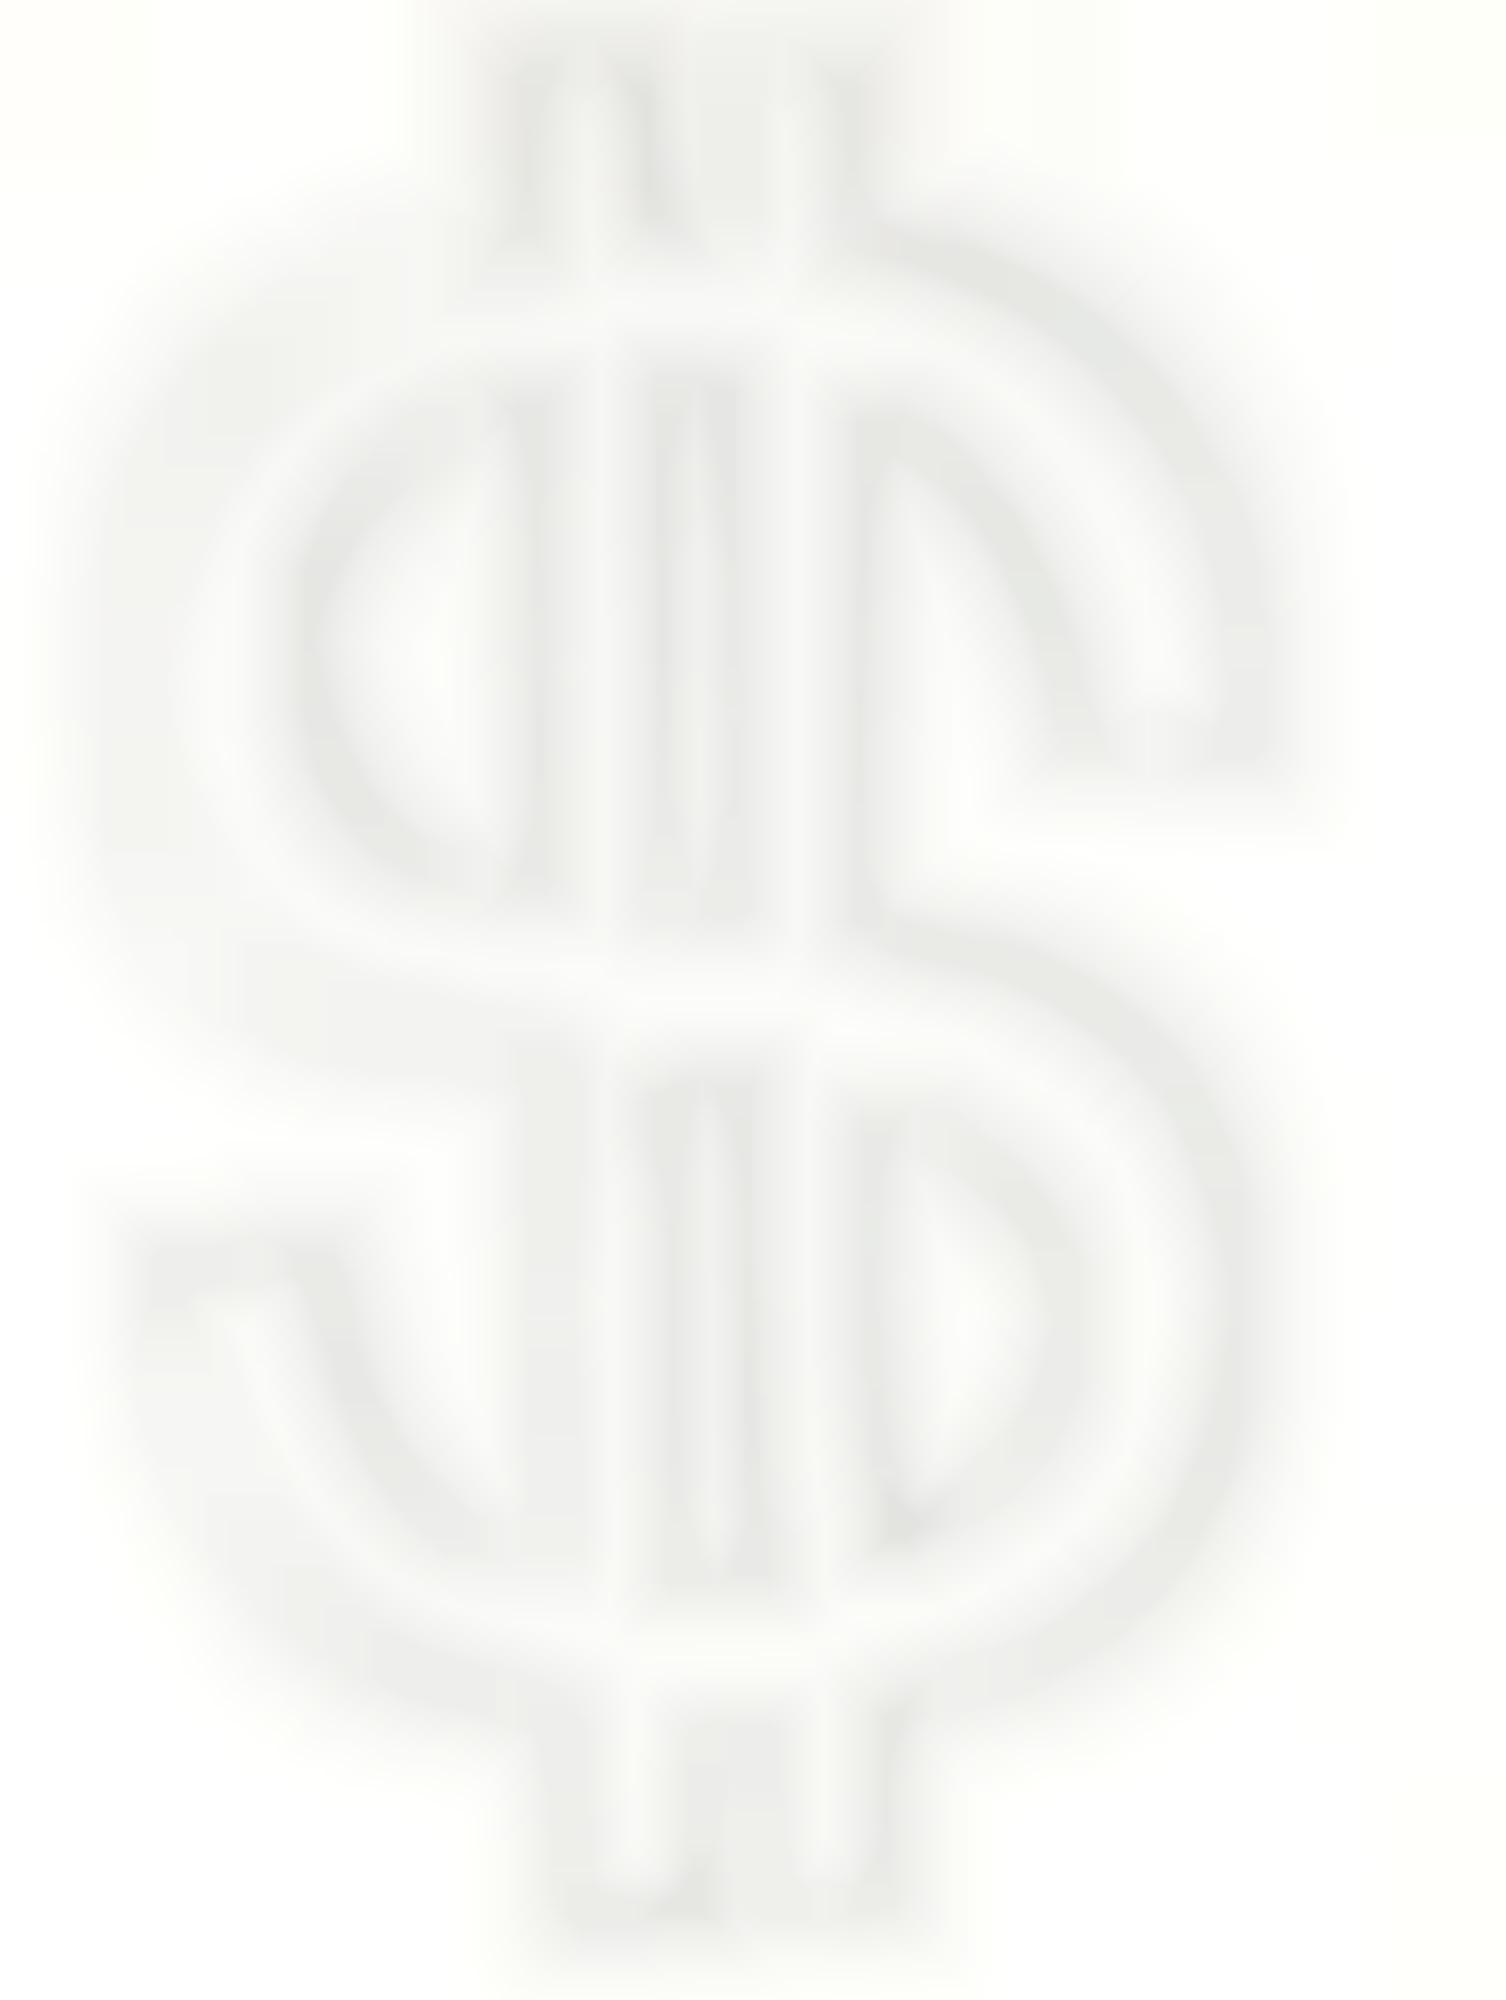 Andy Warhol-Dollar Sign-1981